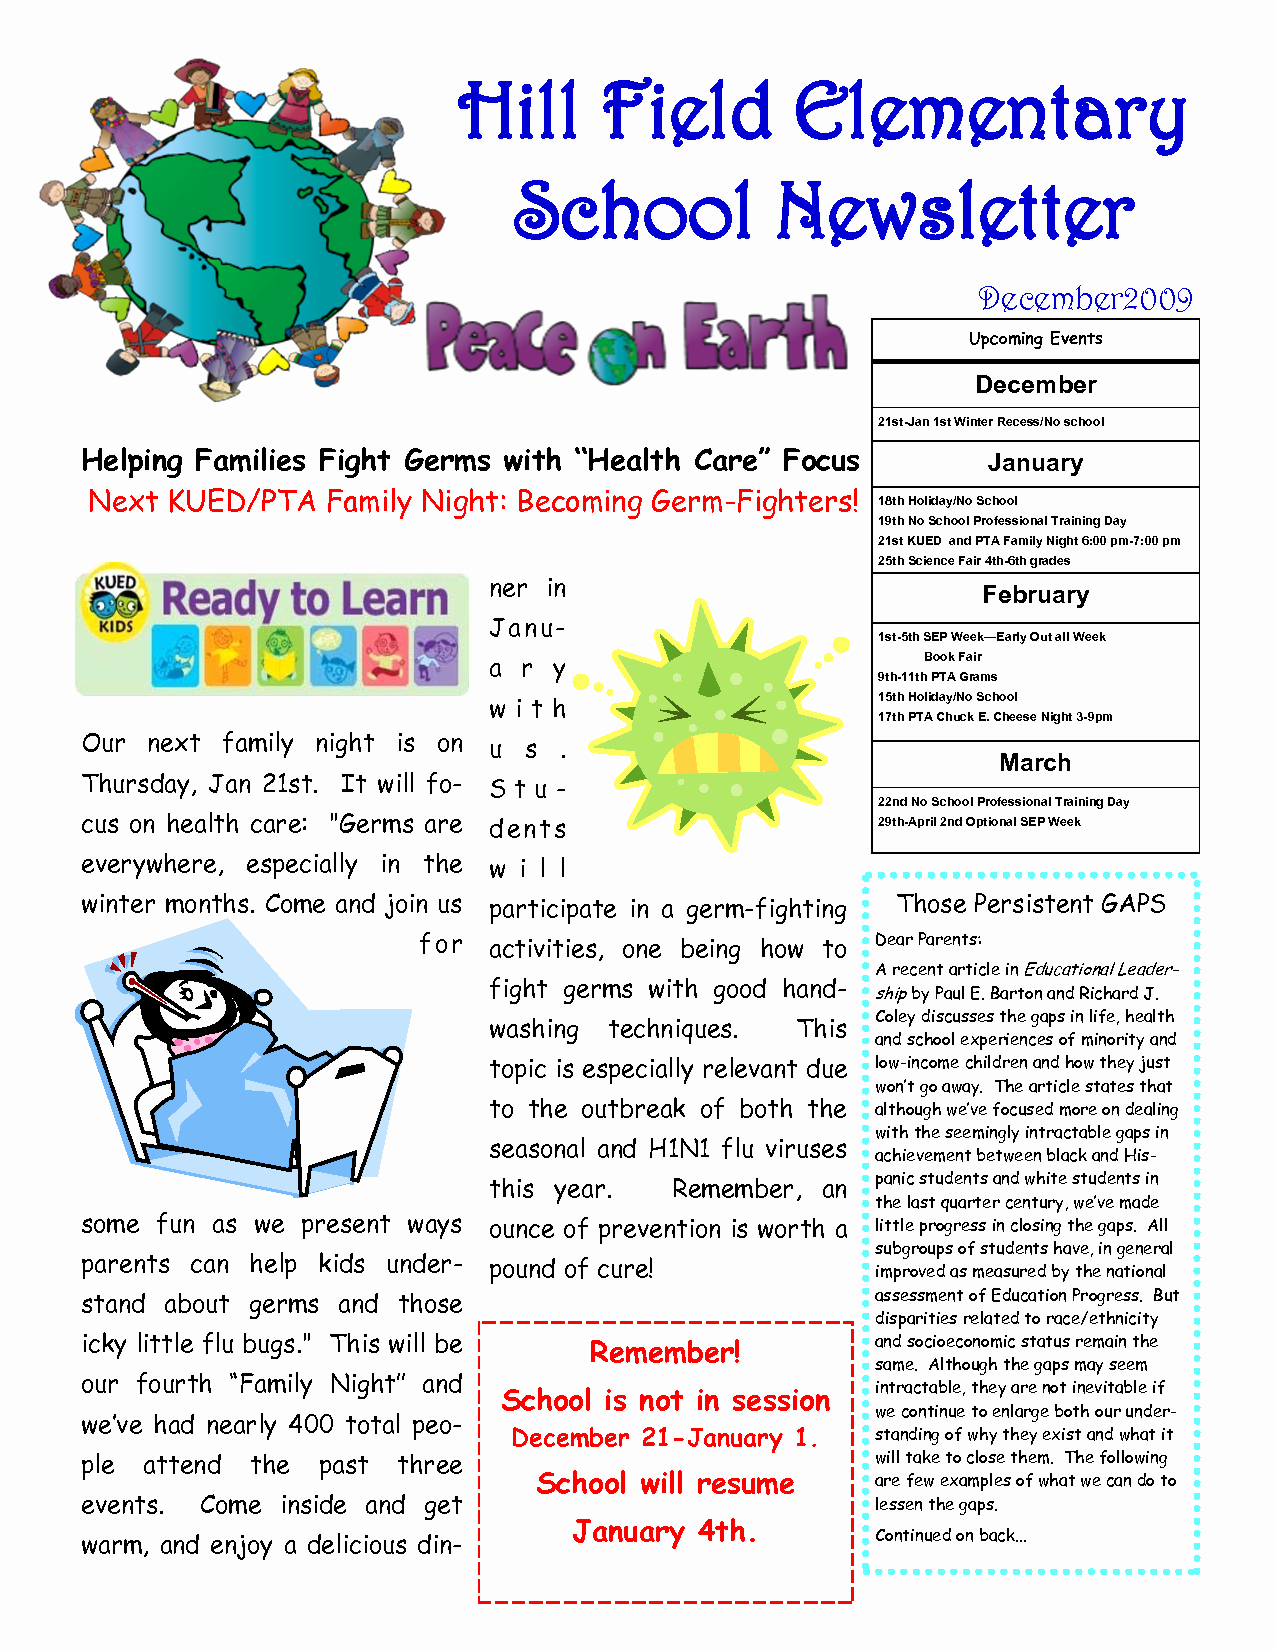 Elementary School Newsletter Template Inspirational 9 Best Of Sample School Newsletter Templates Free